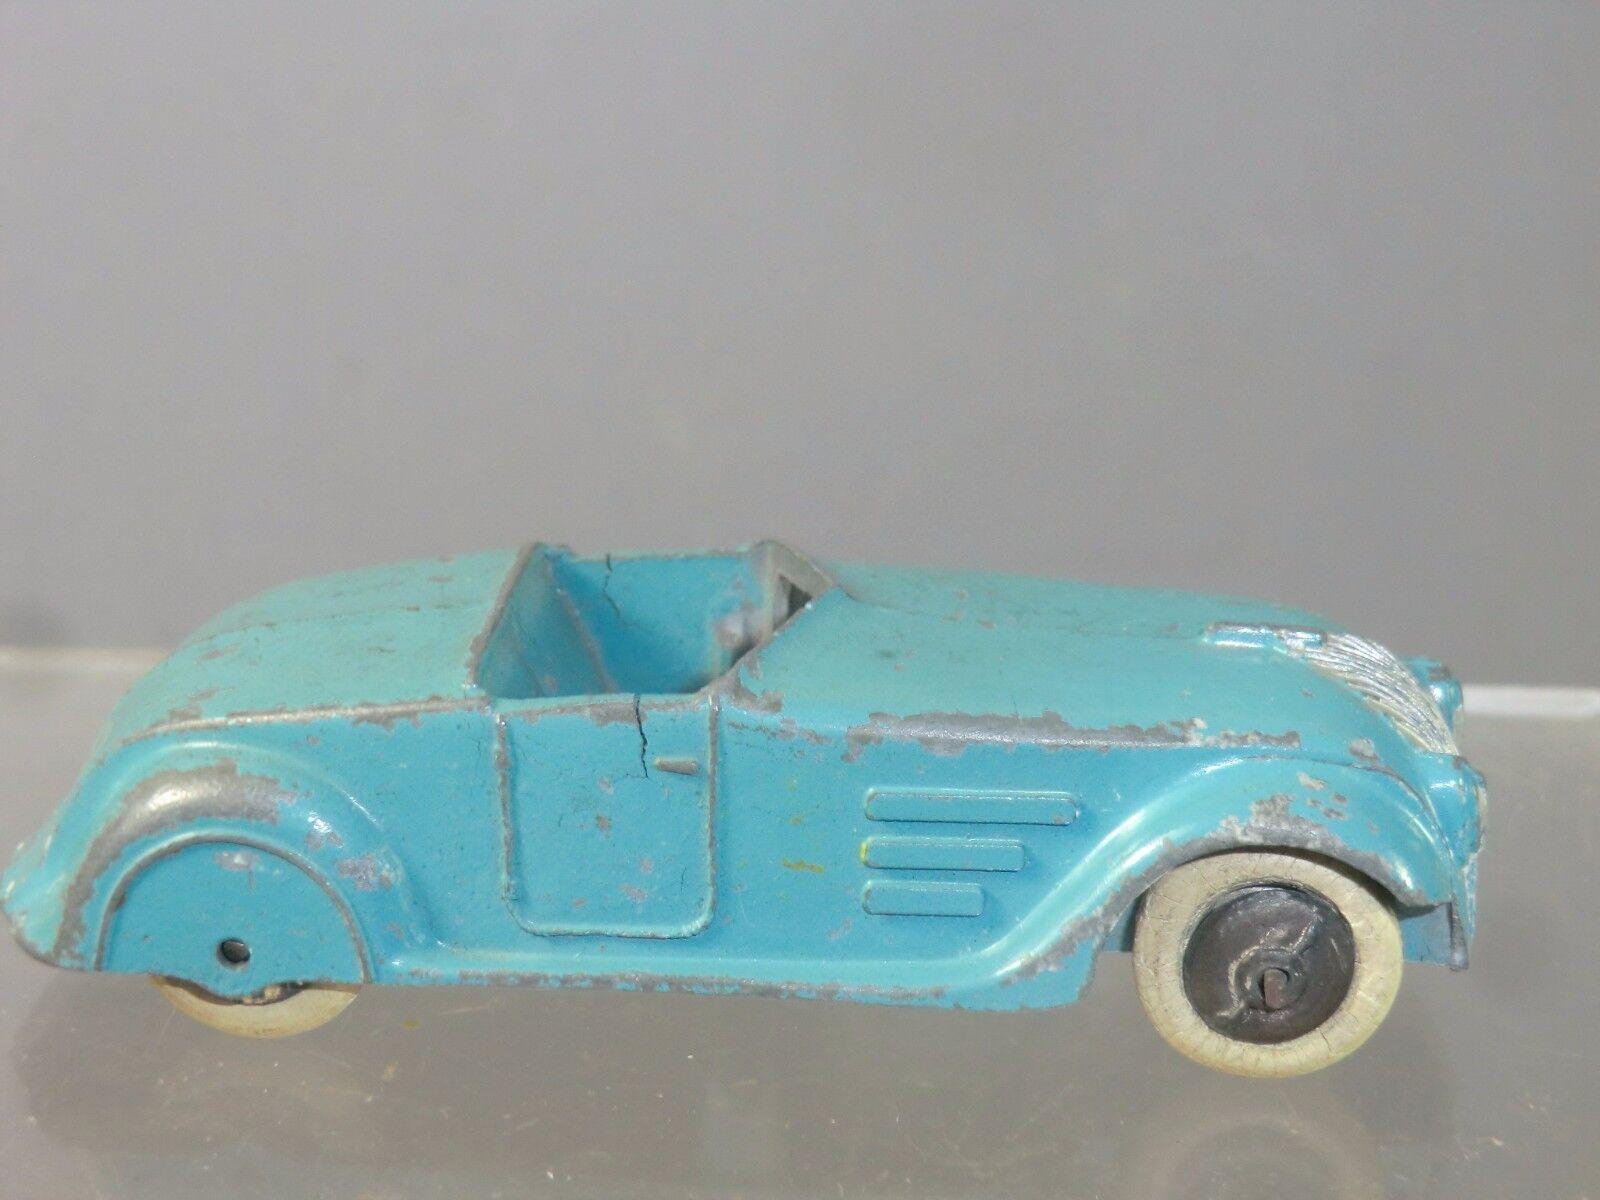 VINTAGE Dinky Toys modello No.22G versione semplificata TORPEDO azul  RARO